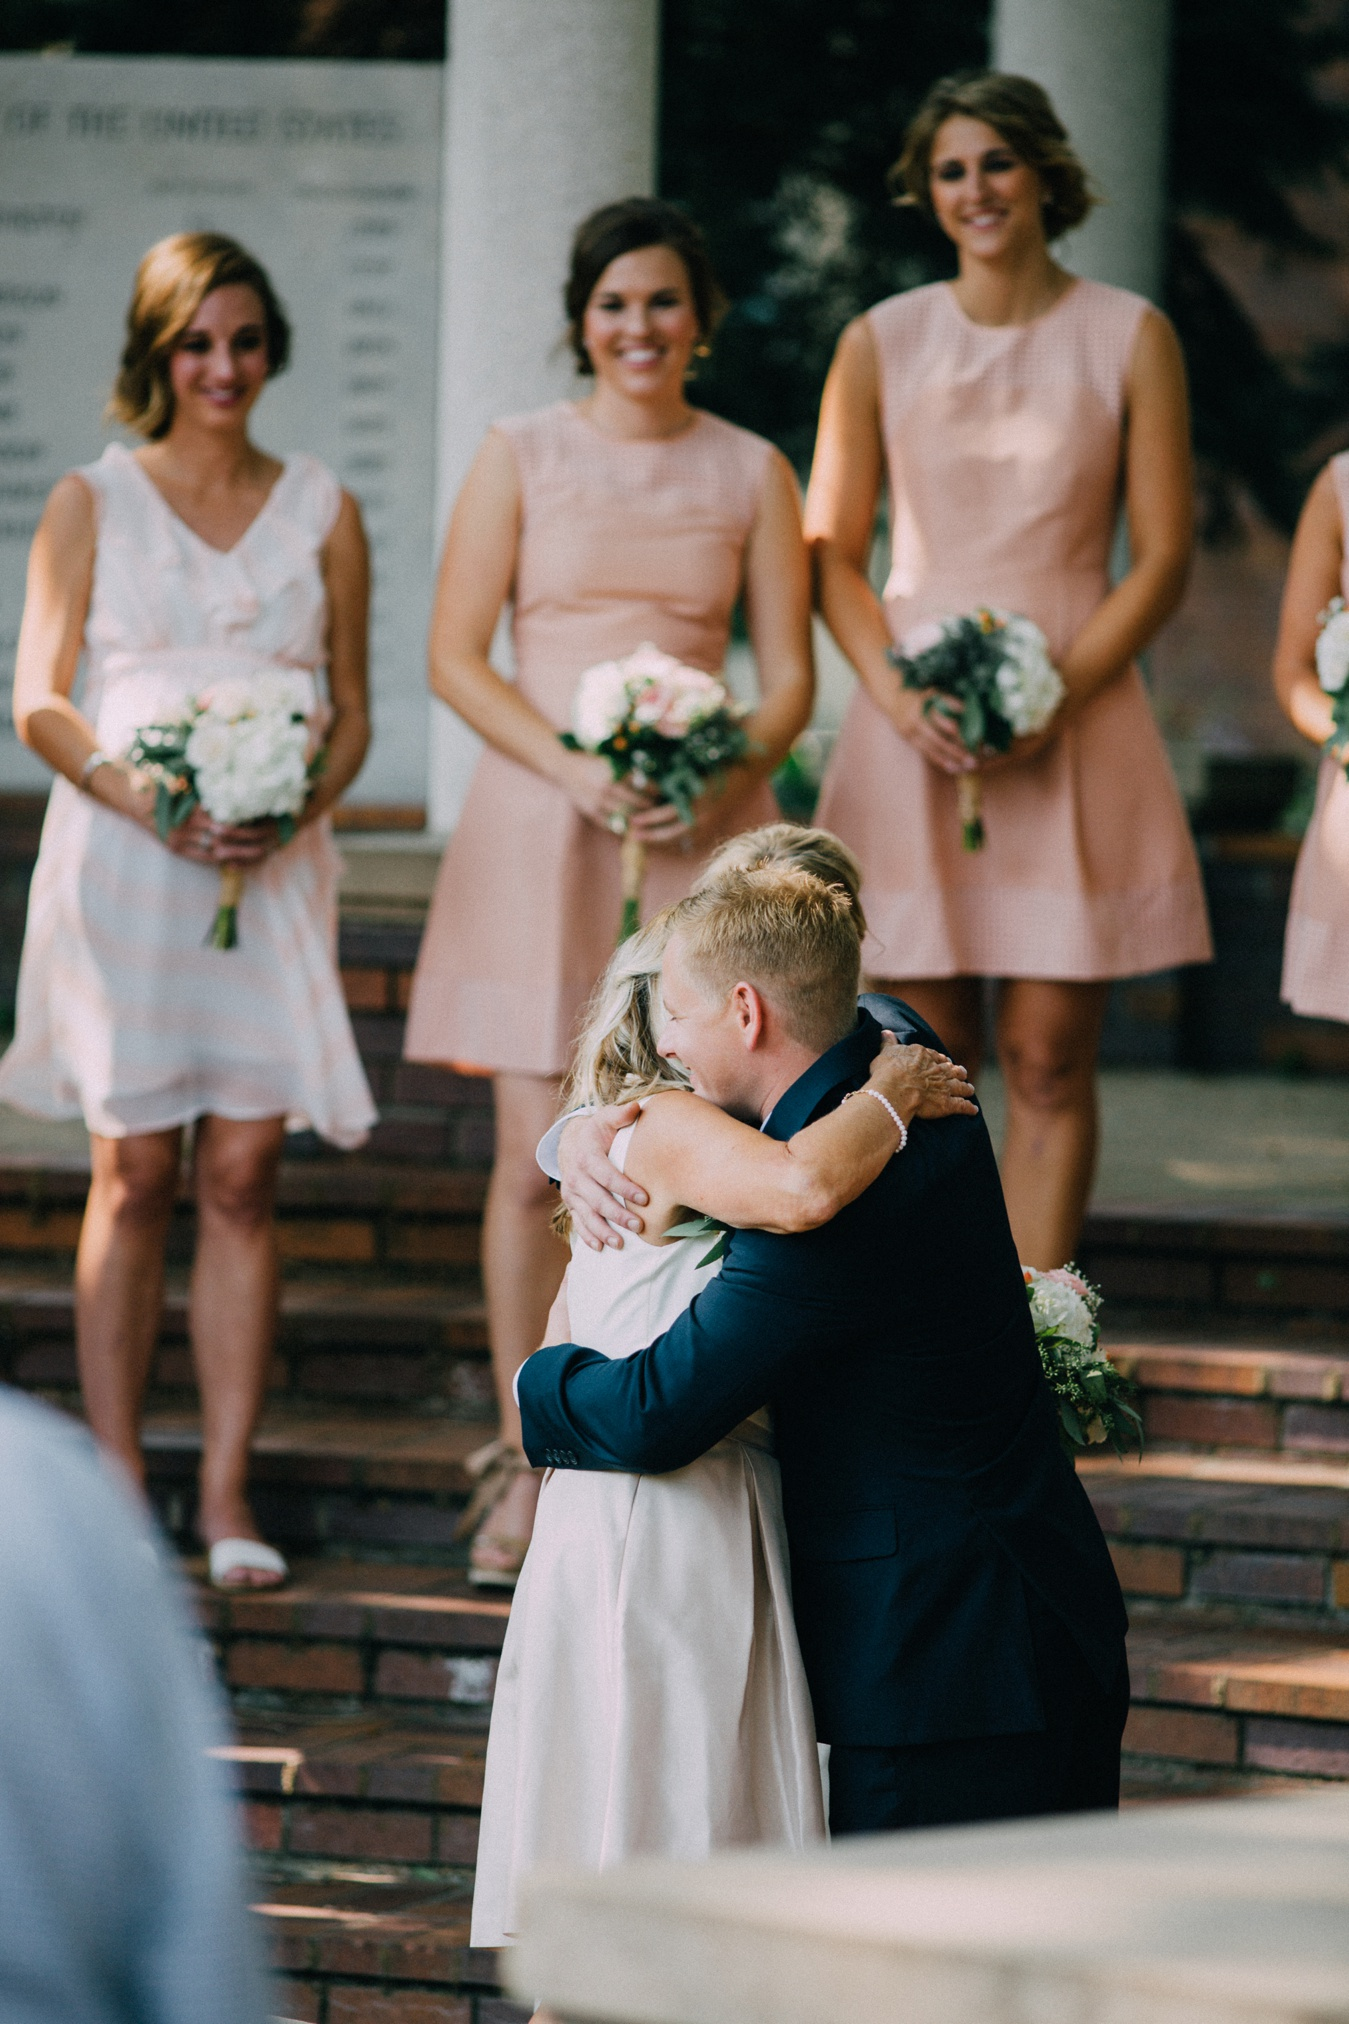 brenna+michael_wedding-396.jpg